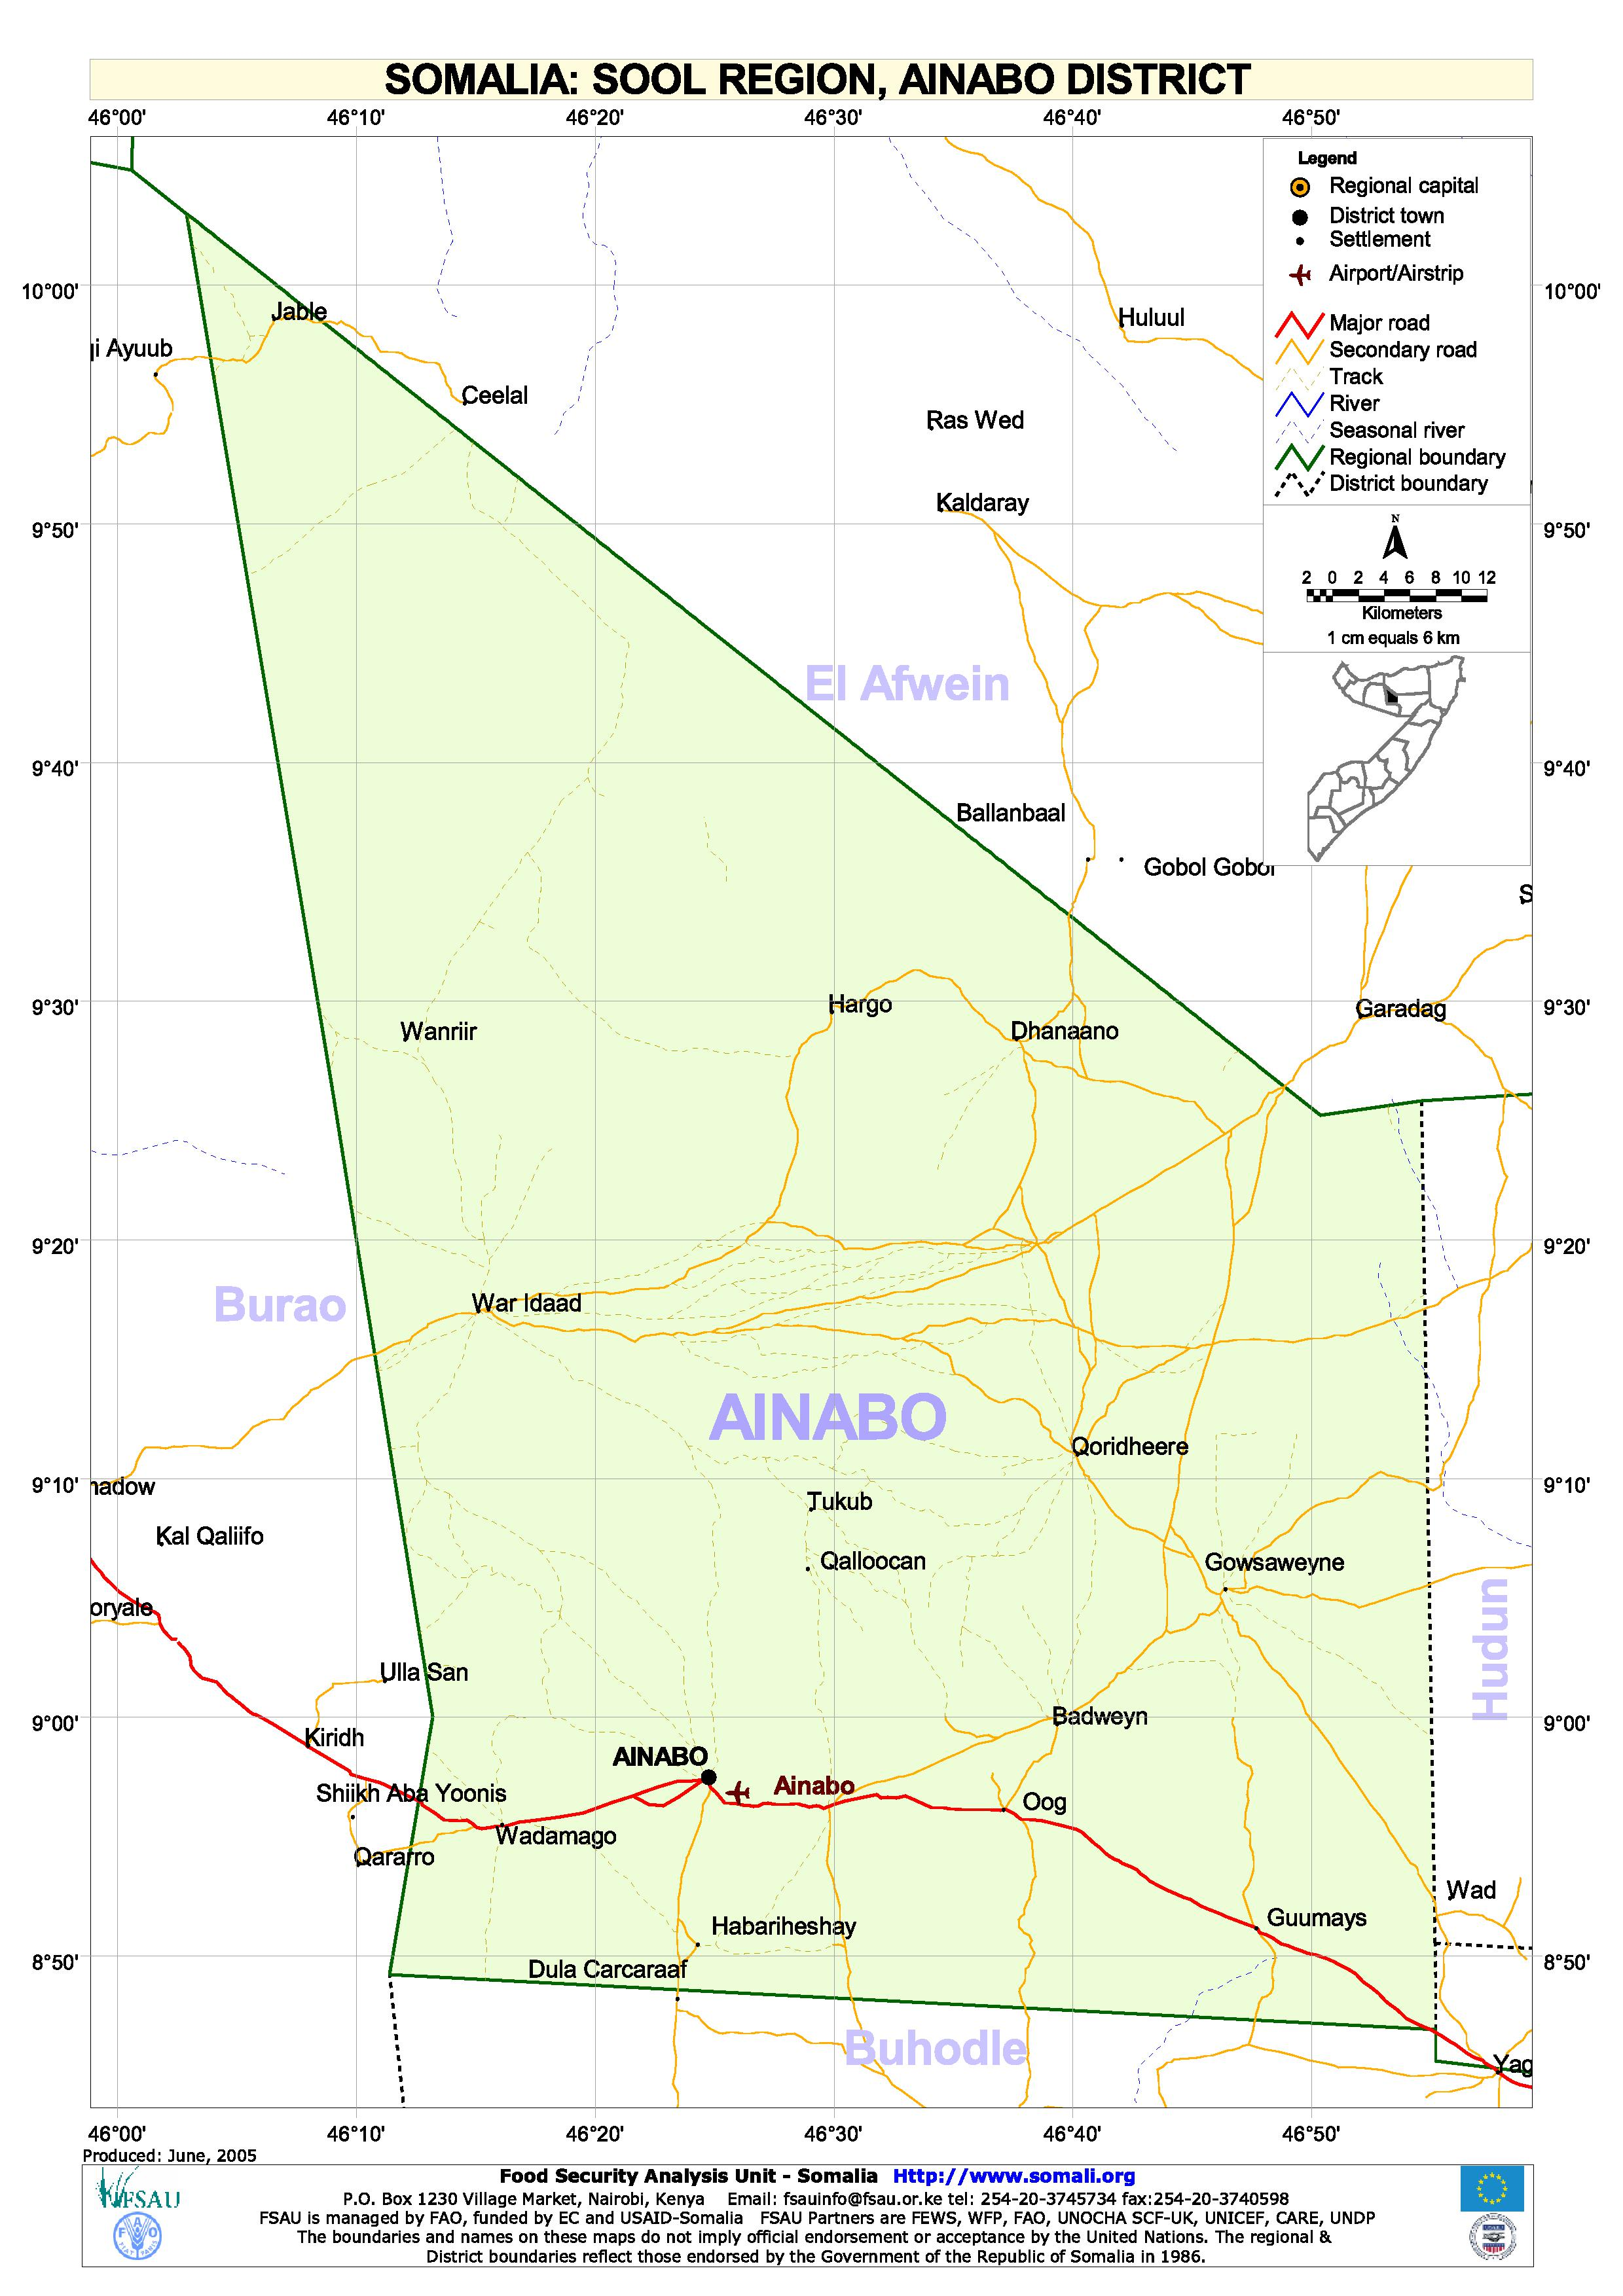 Somalia-Sool-Region-Ainabo-District.jpg